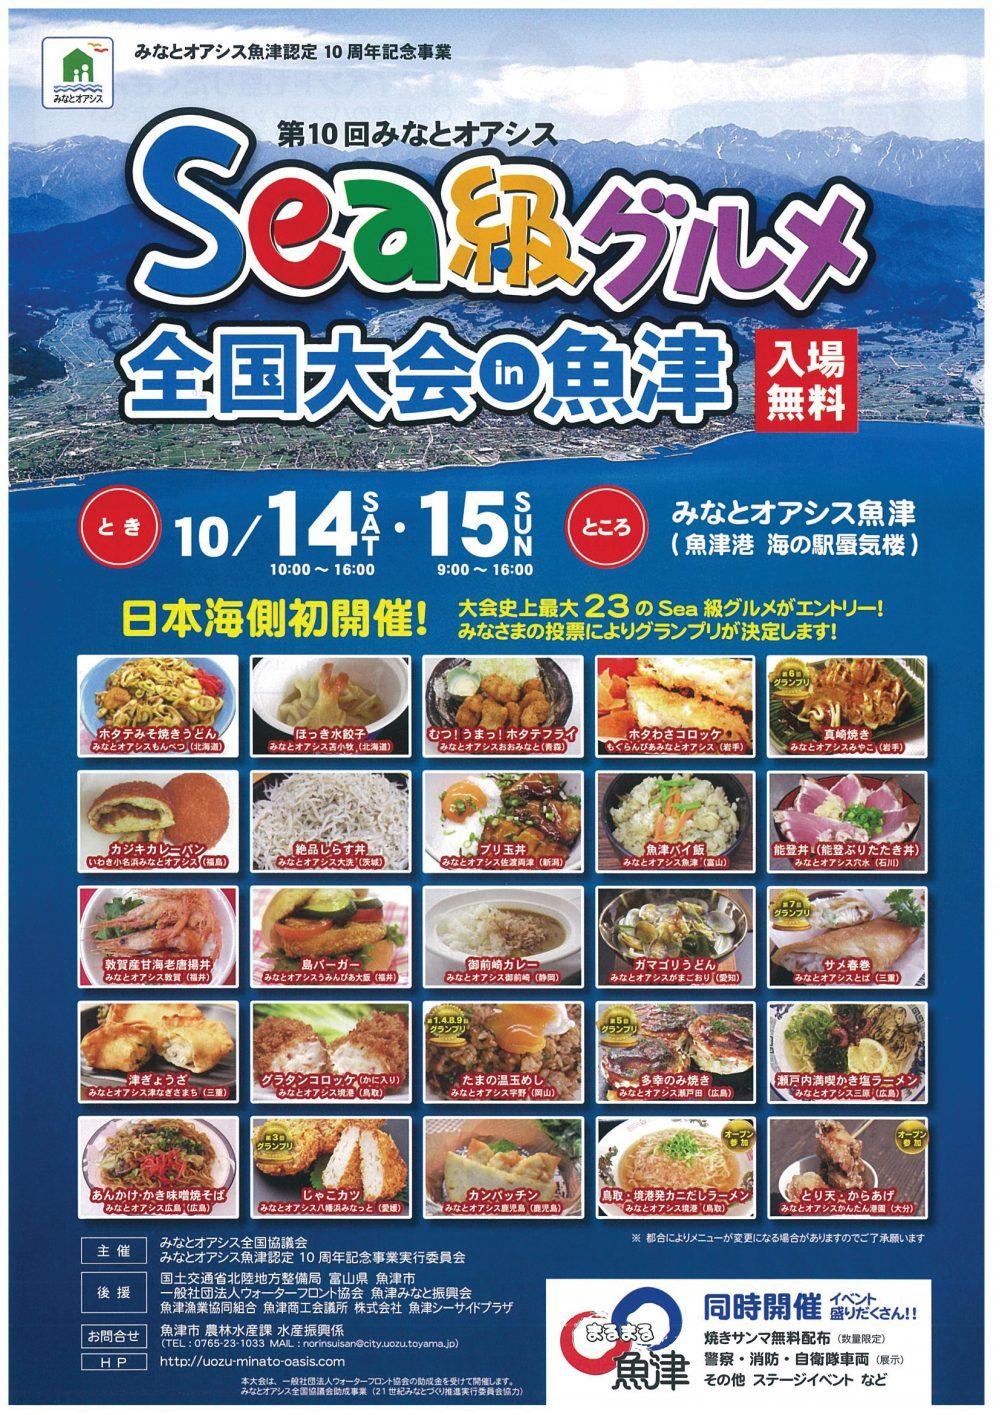 20171014-15Sea級グルメ全国大会-001